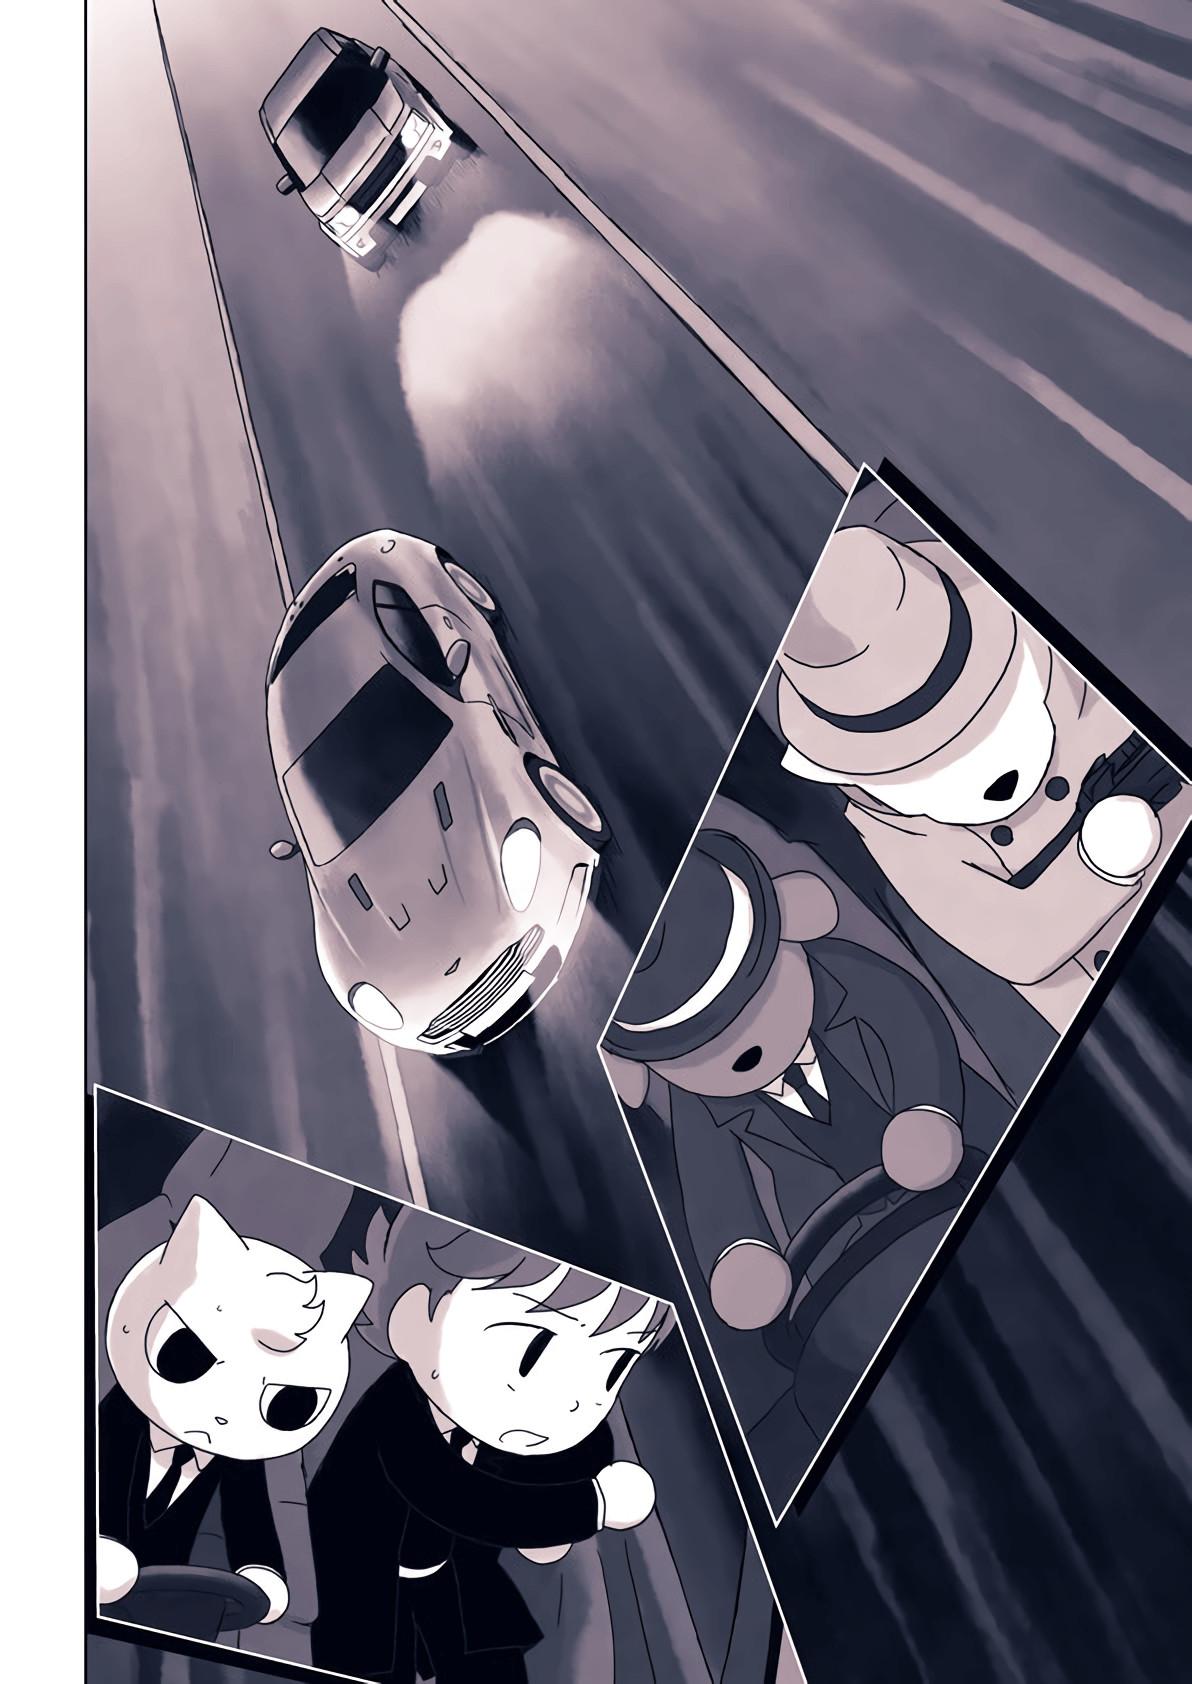 https://r1.ninemanga.com/comics/pic2/5/31749/333766/1505307941766.jpg Page 39